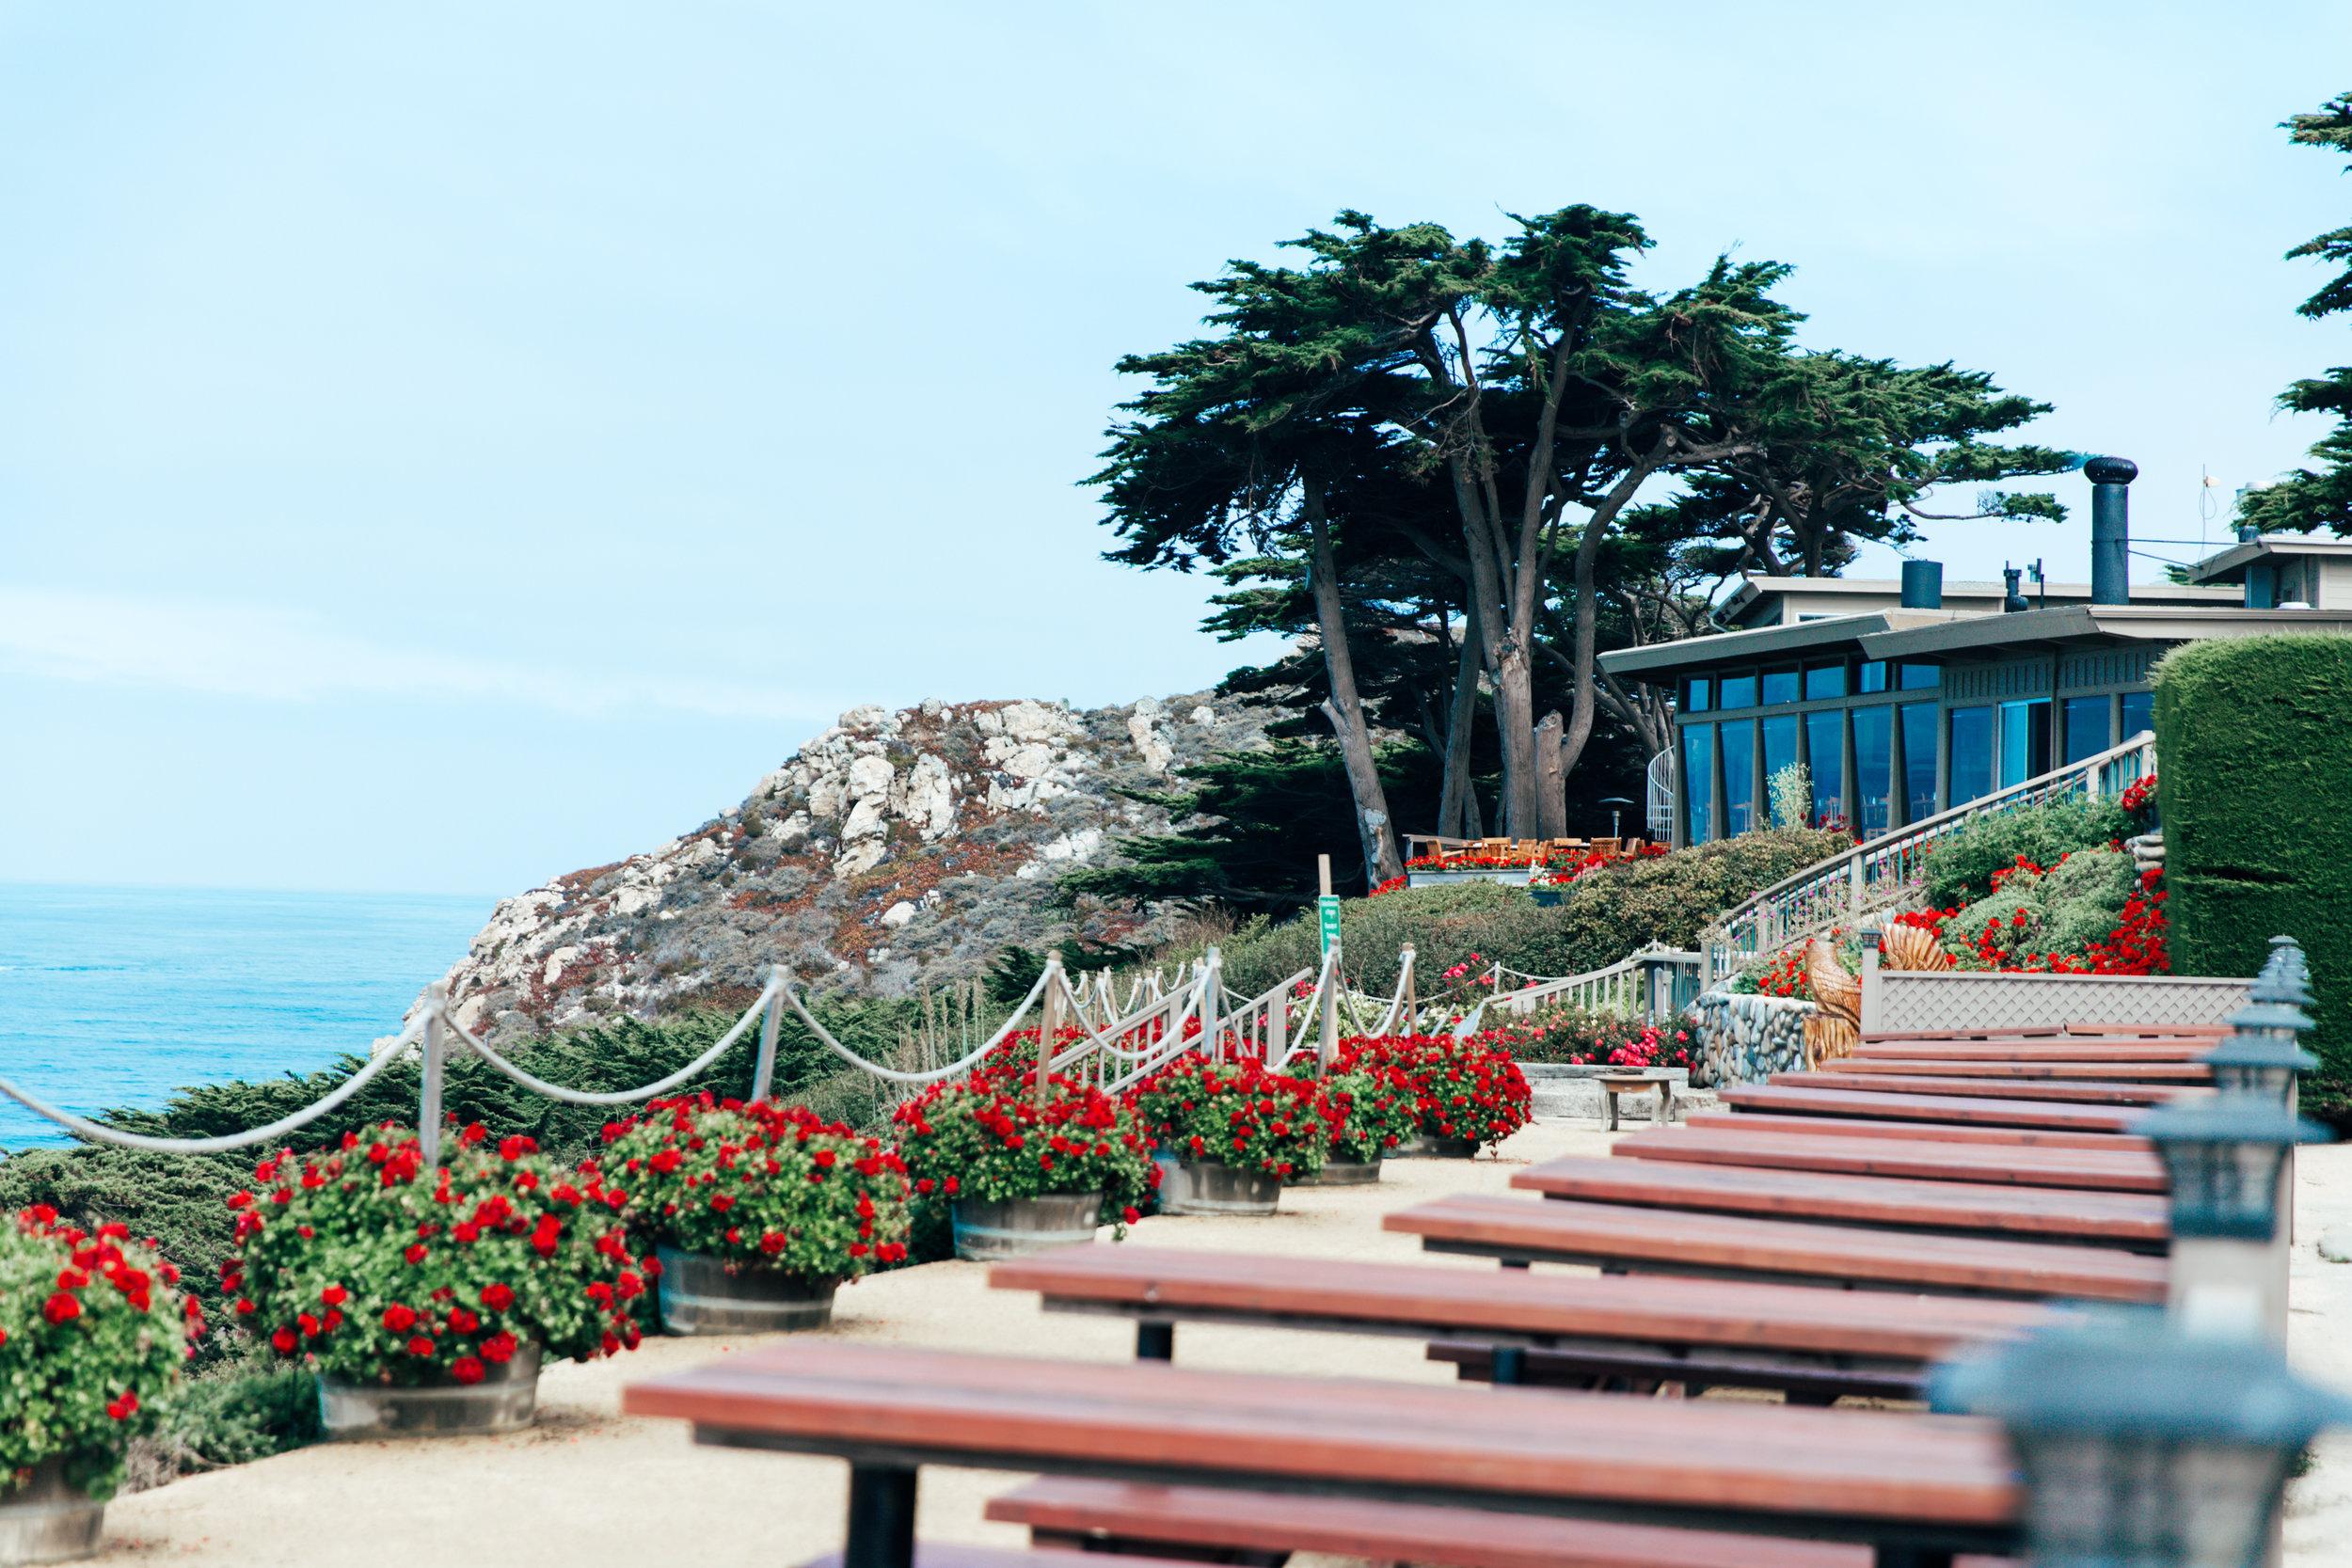 Stay_Driven_Monterey_Car_Week_Koenigsegg-43.jpg